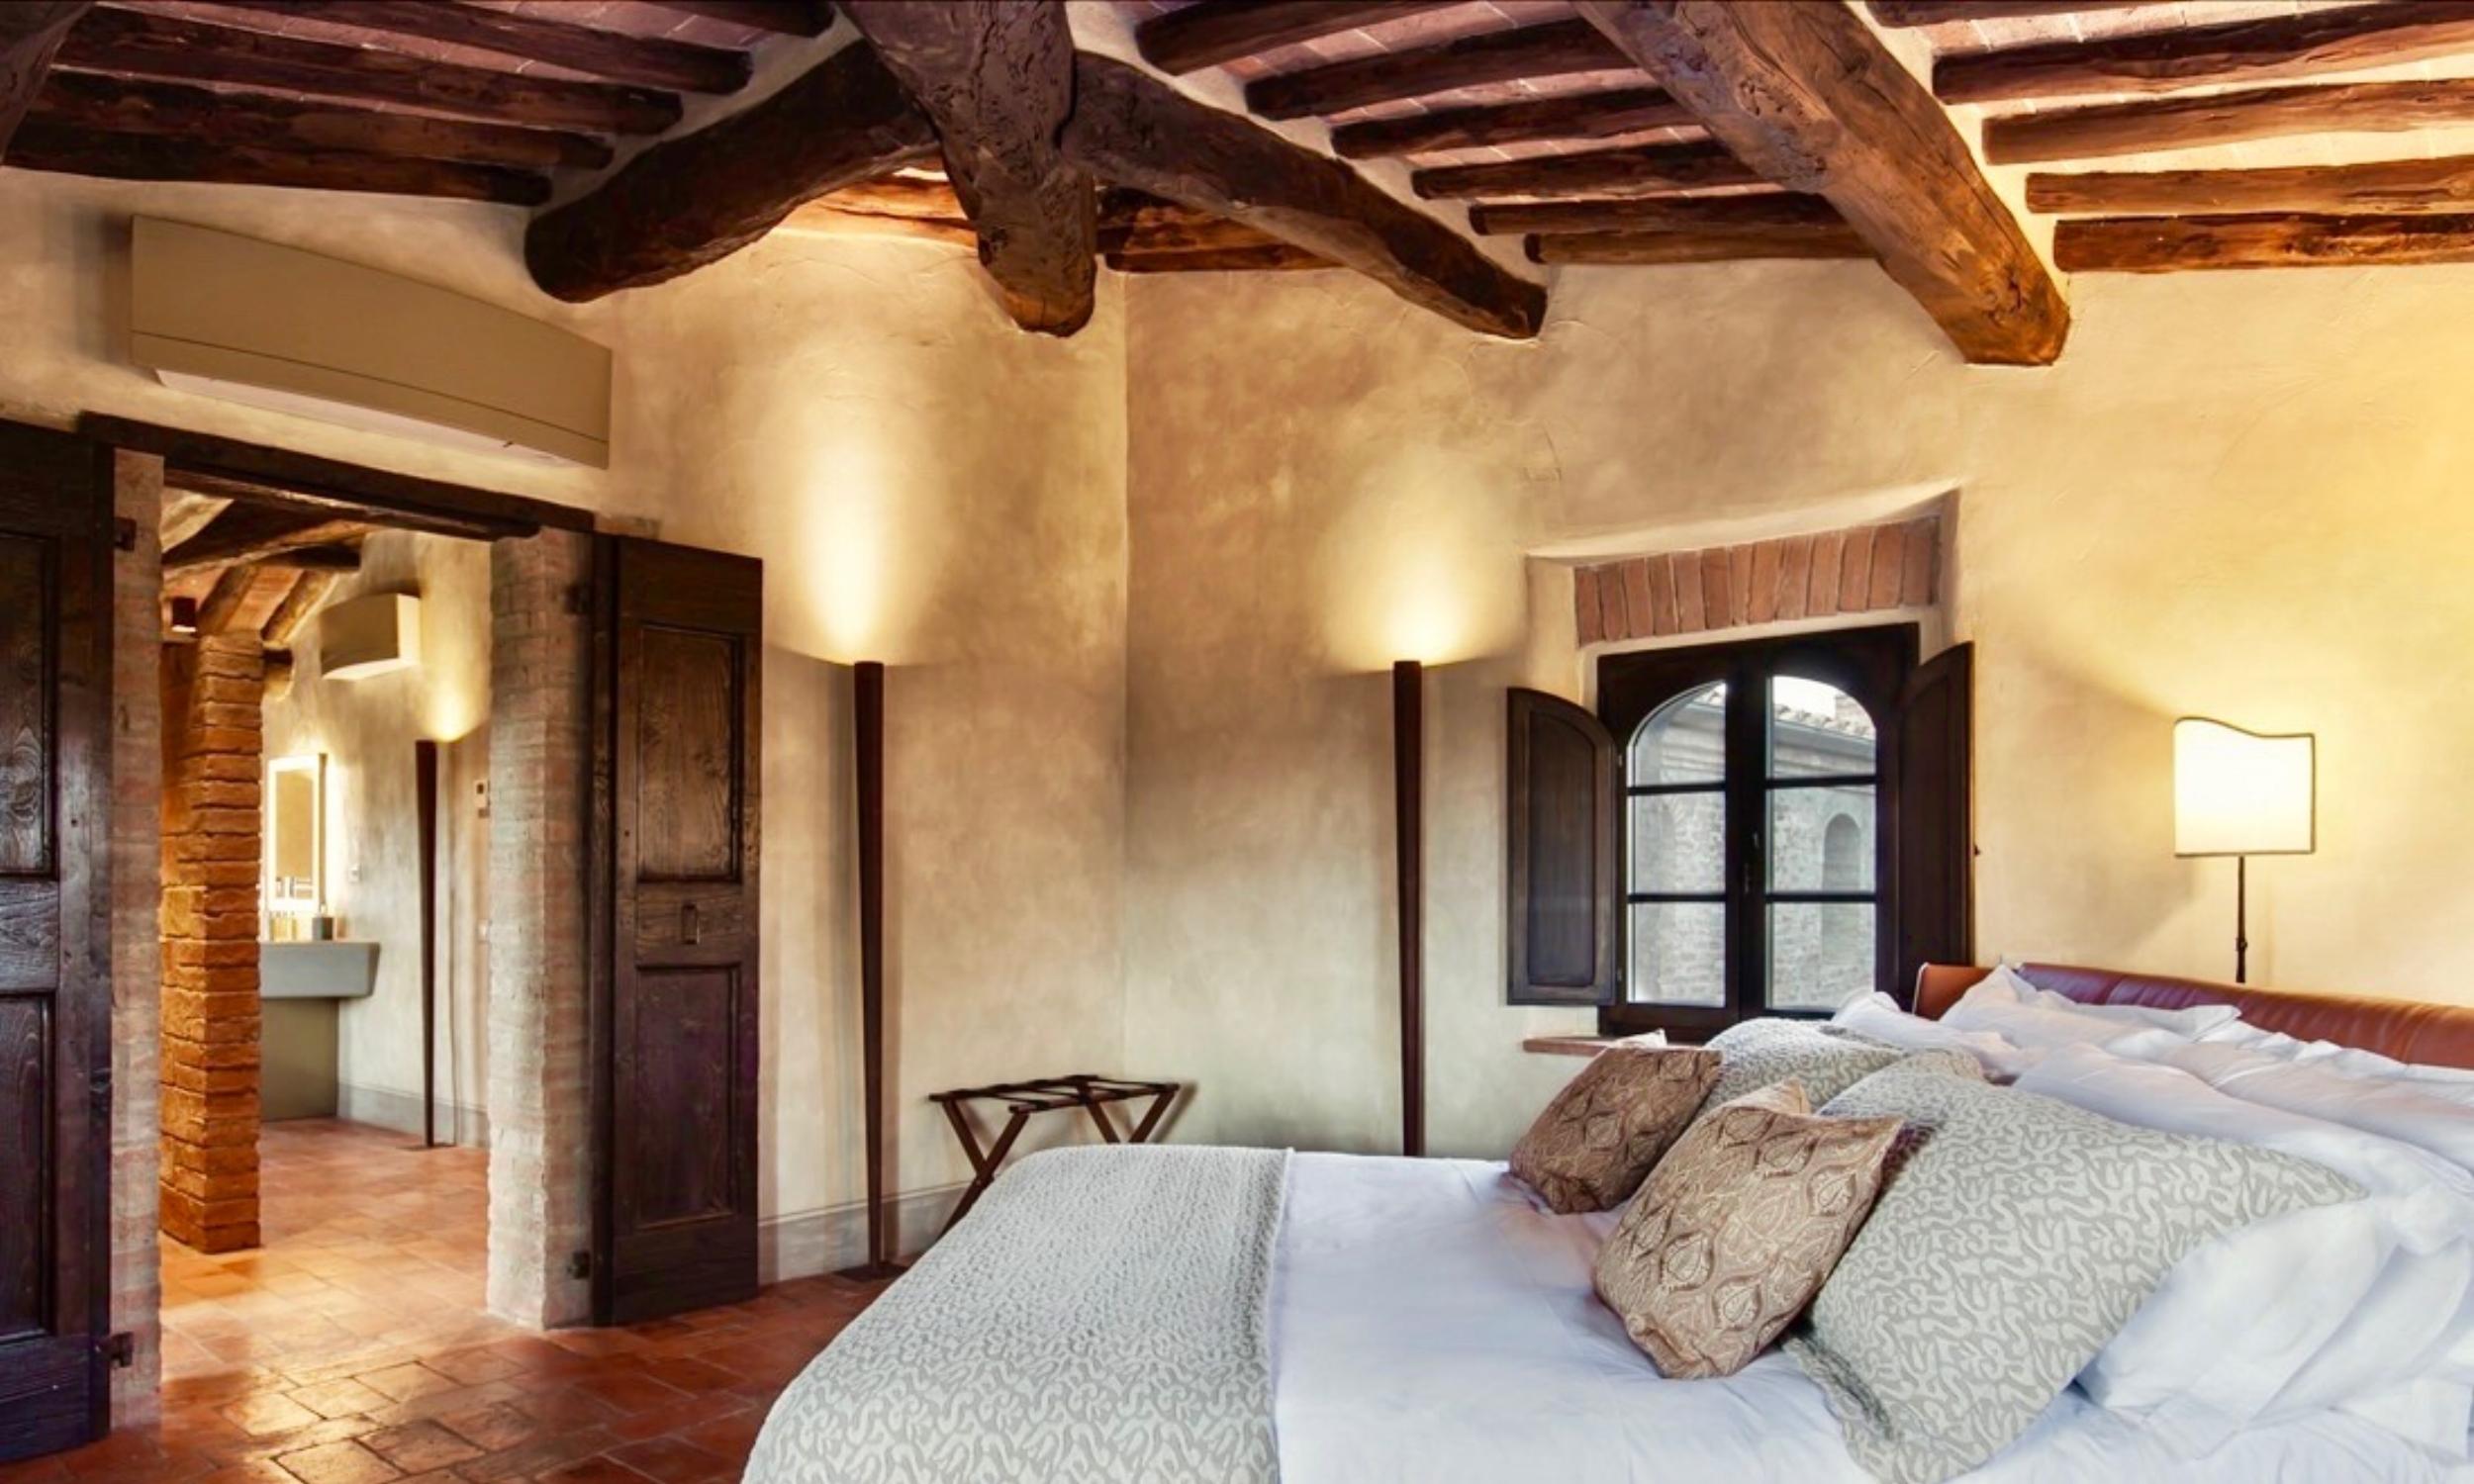 Bedroom03-01.jpg